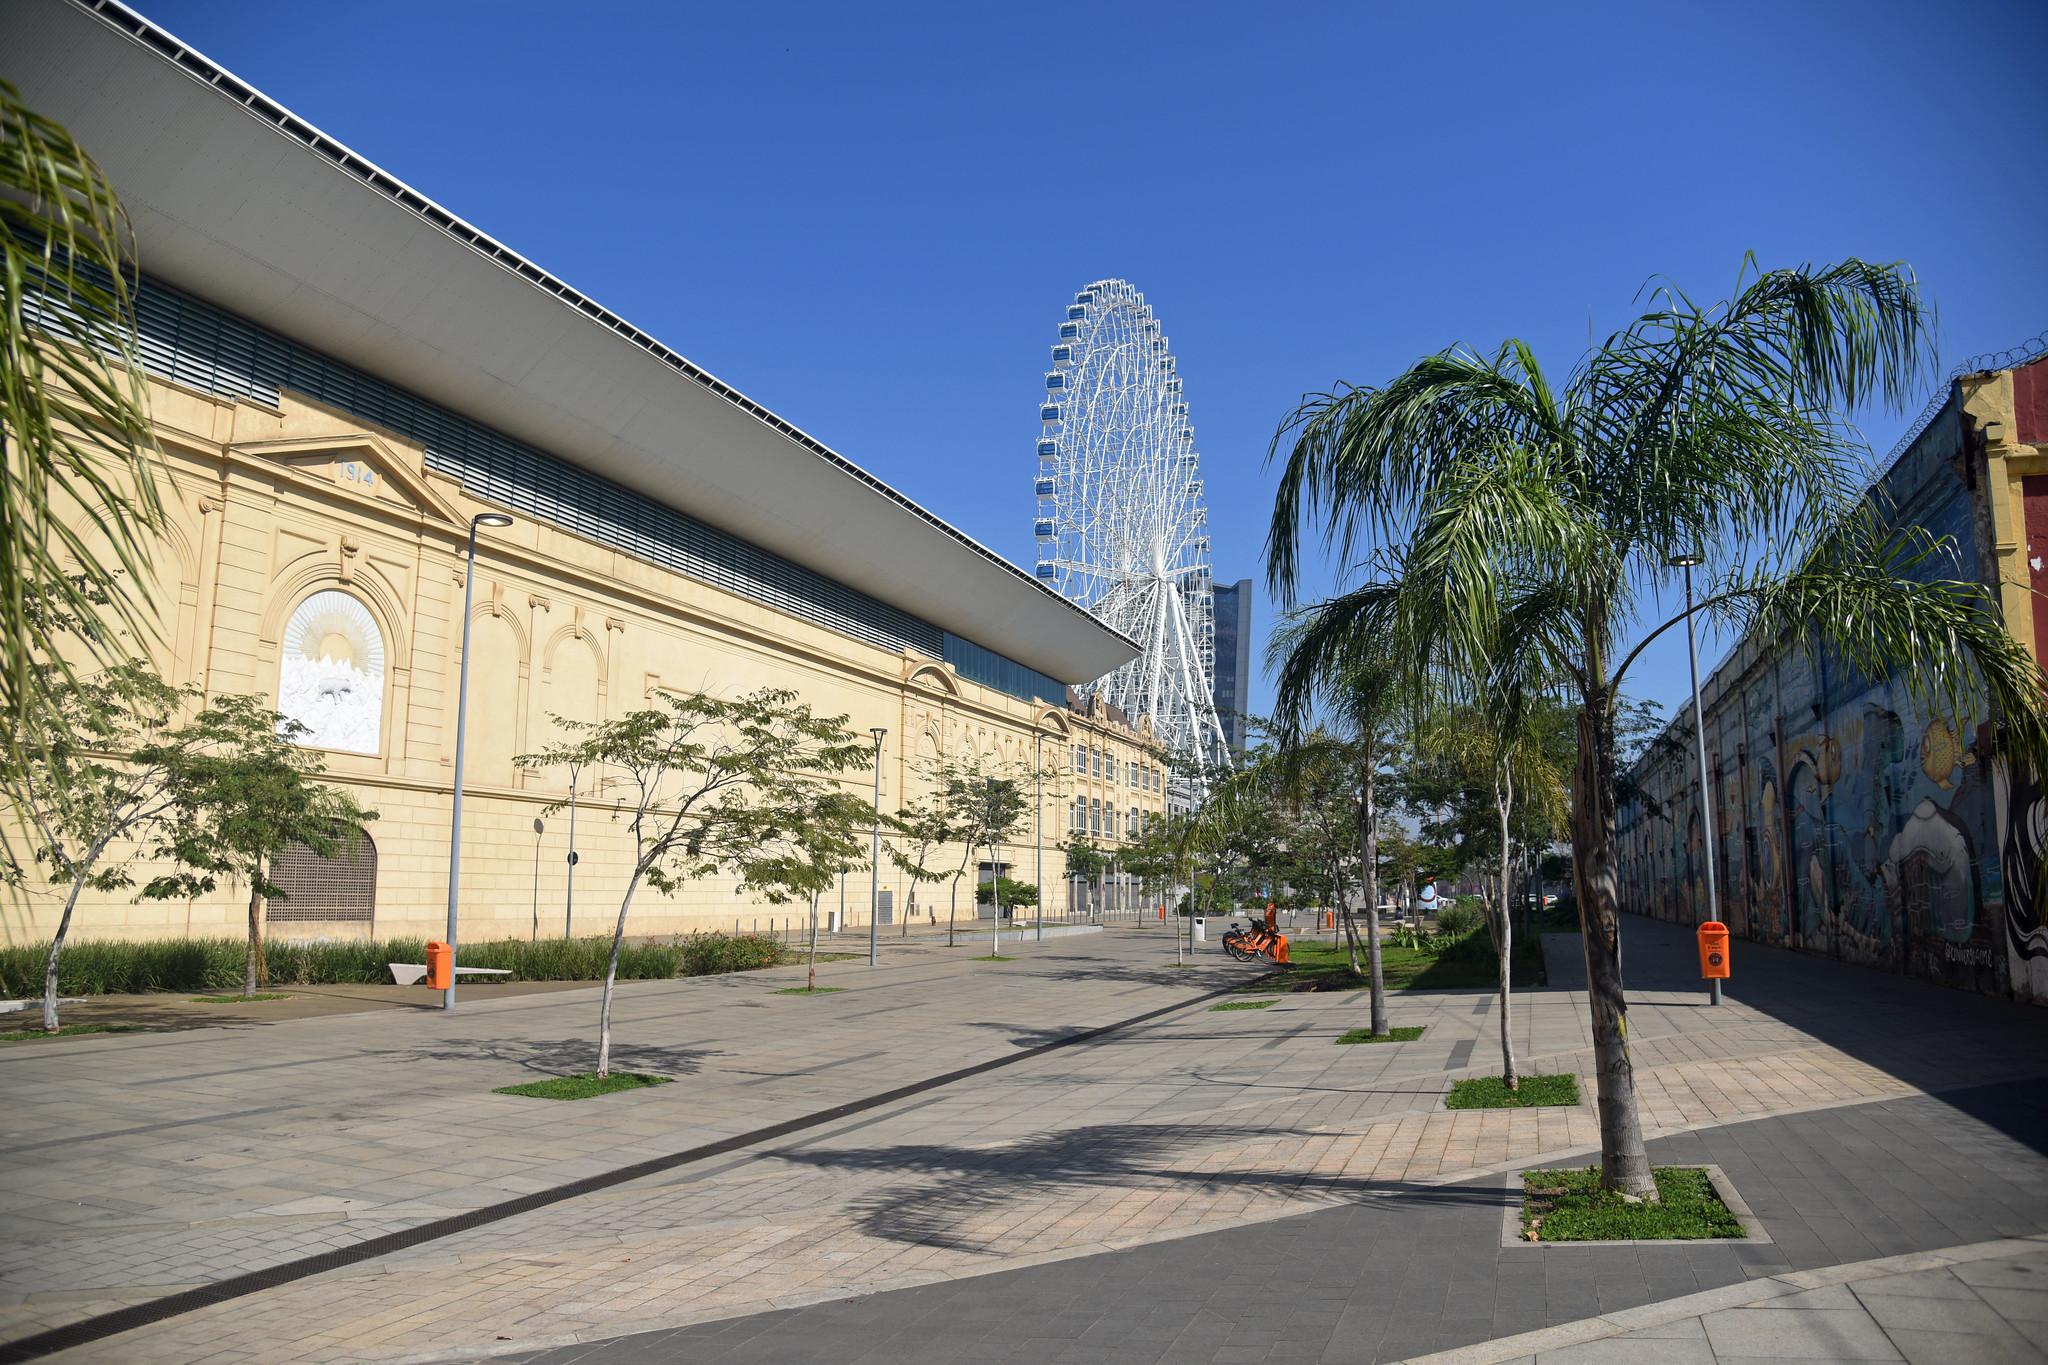 Boulevard Olímpico